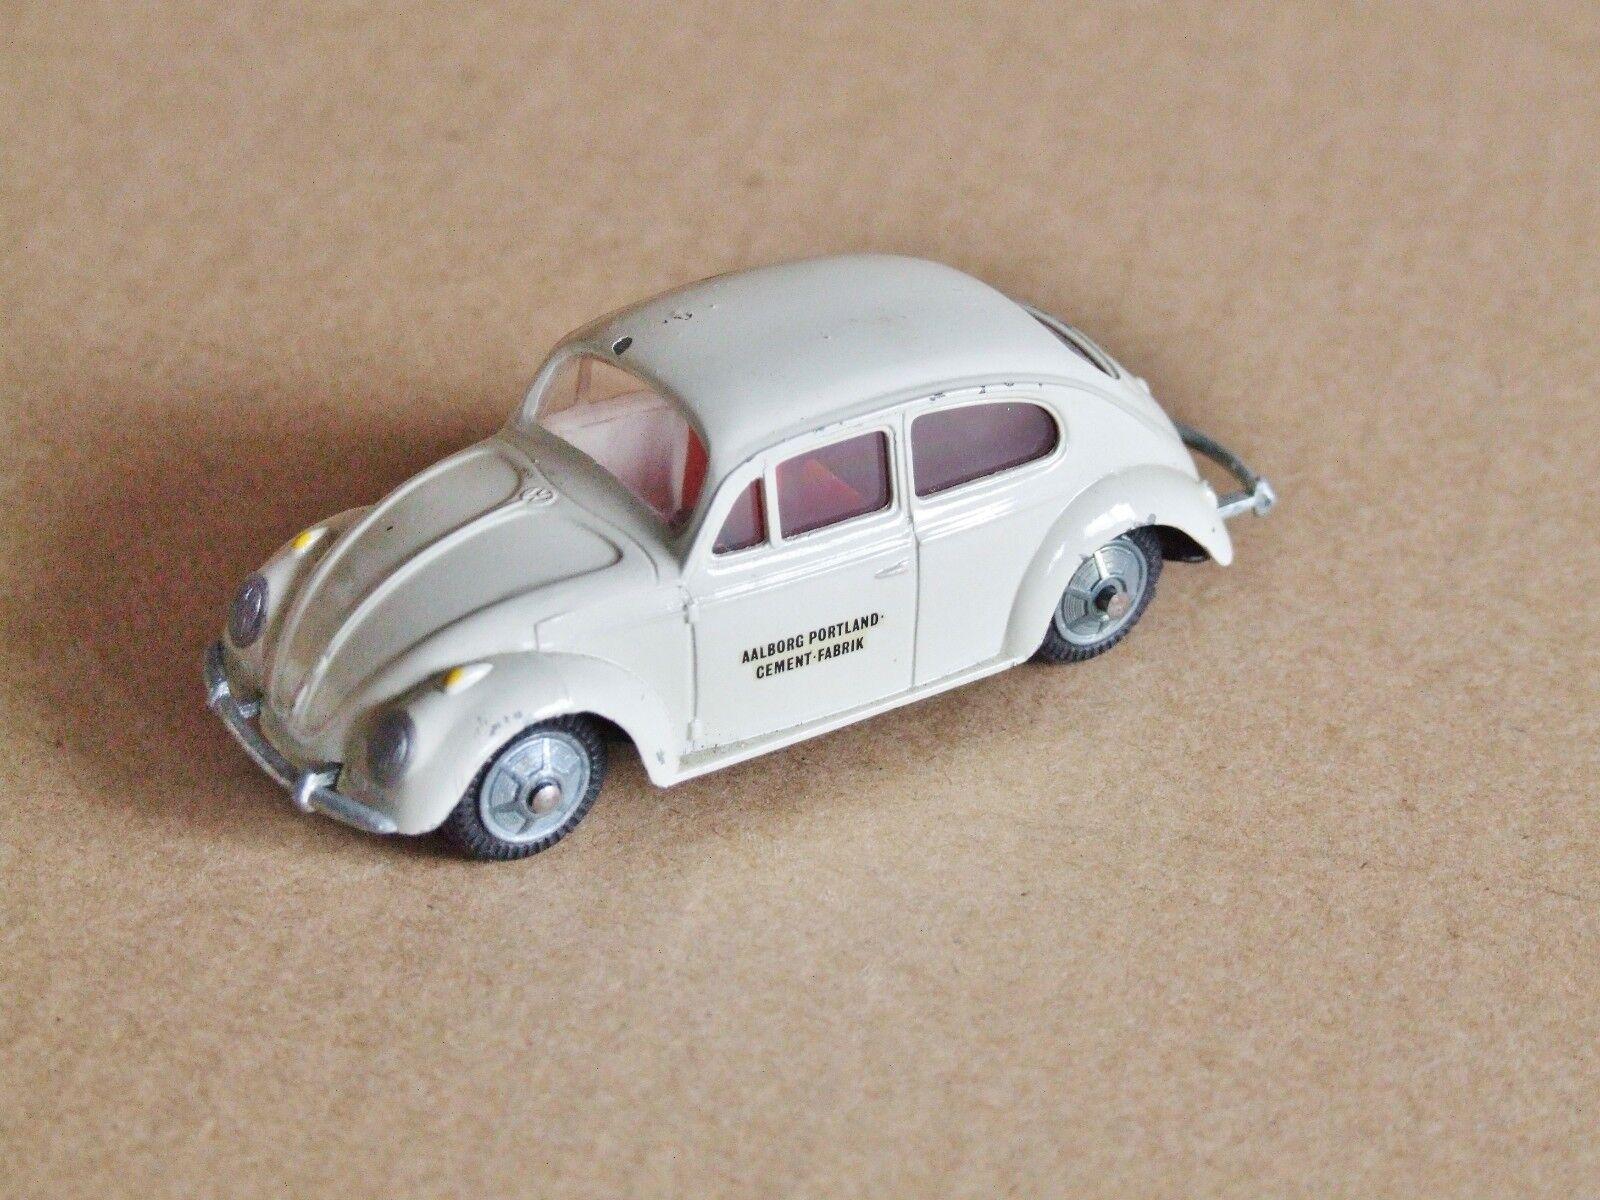 TEKNO 819 Volkswagen AALBORG PORTLAND CEMENT FABRIK - very RARE Promotional